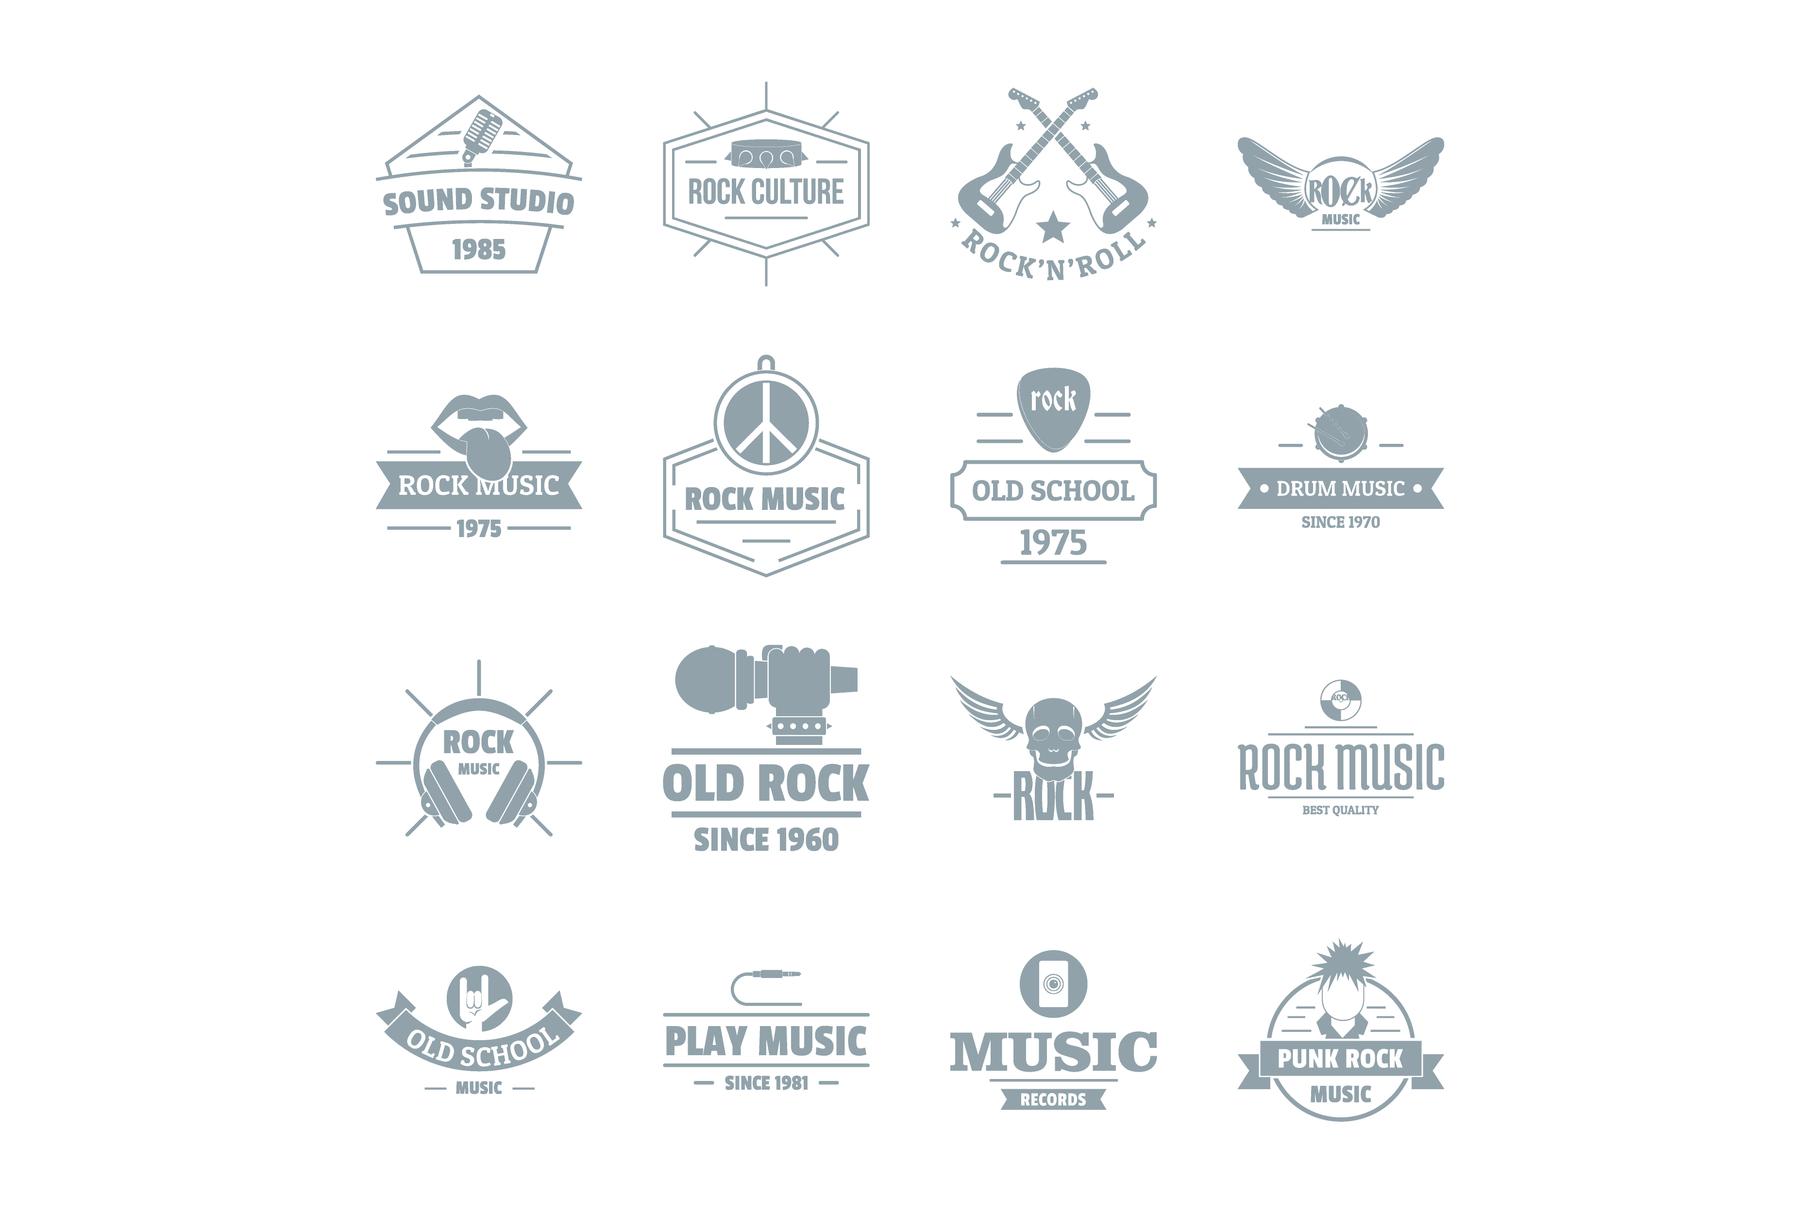 Rock music logo icons set, simple style example image 1